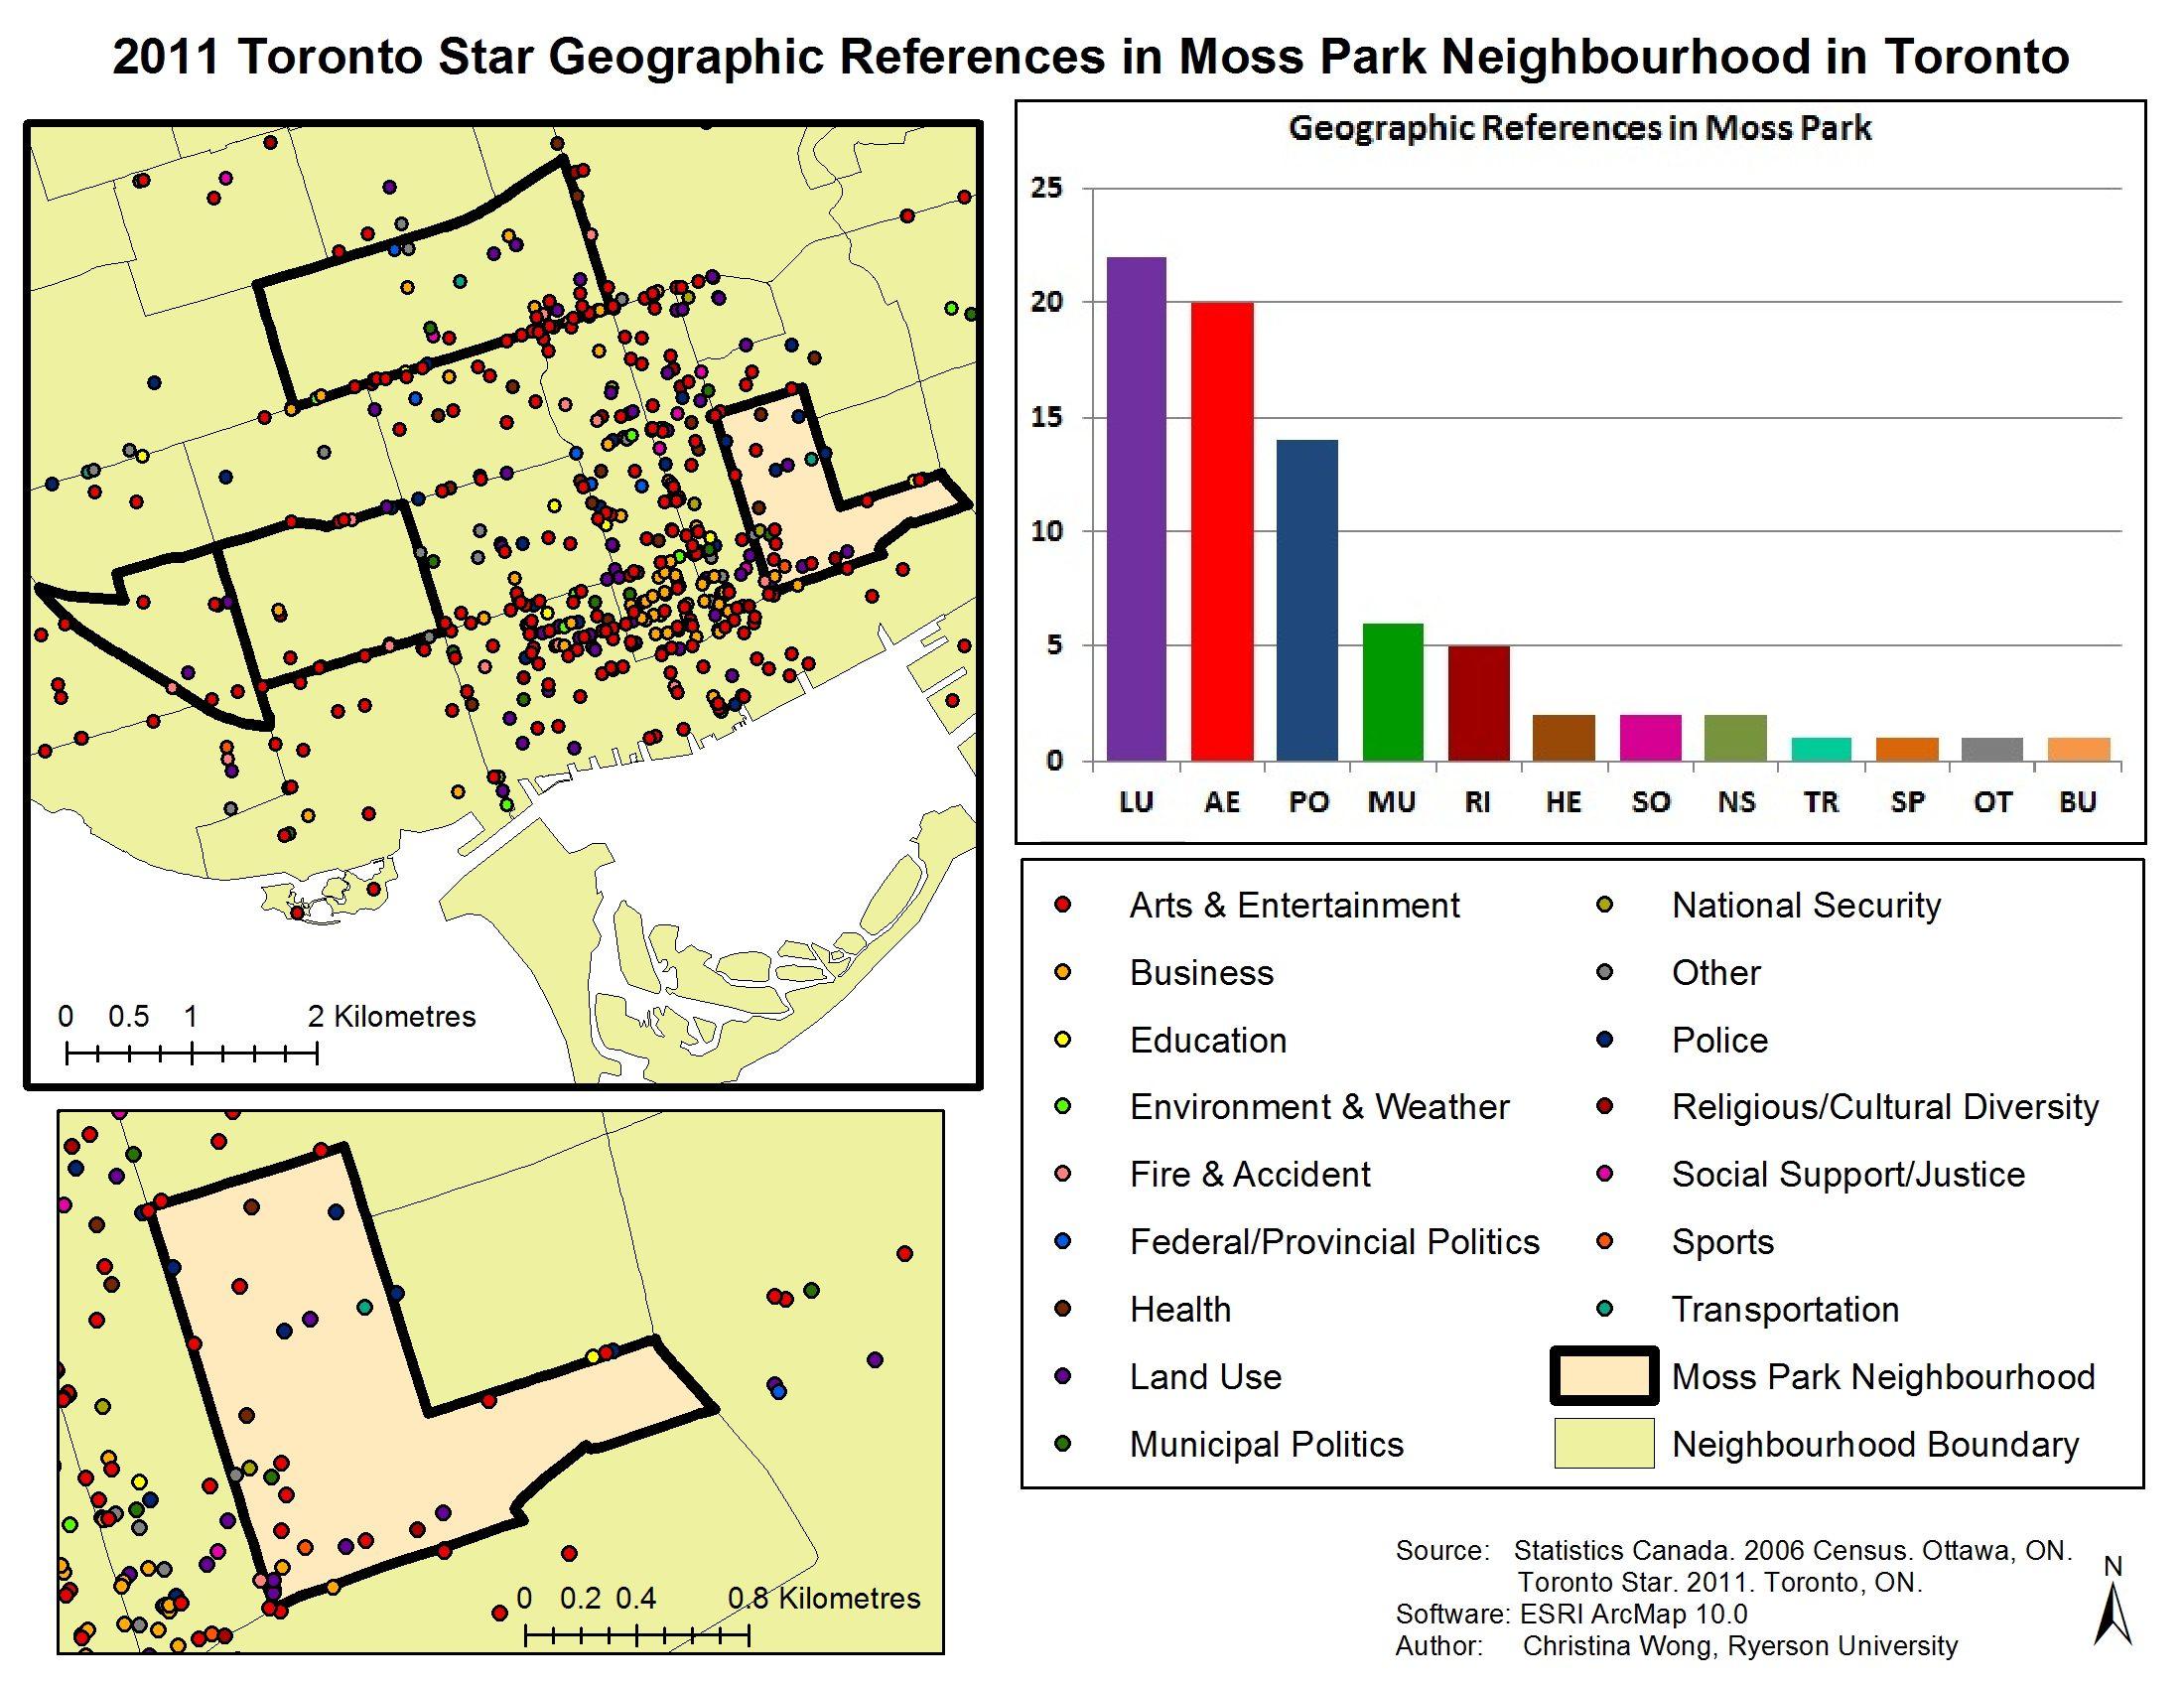 Figure 6. Toronto Star coverage of Moss Park